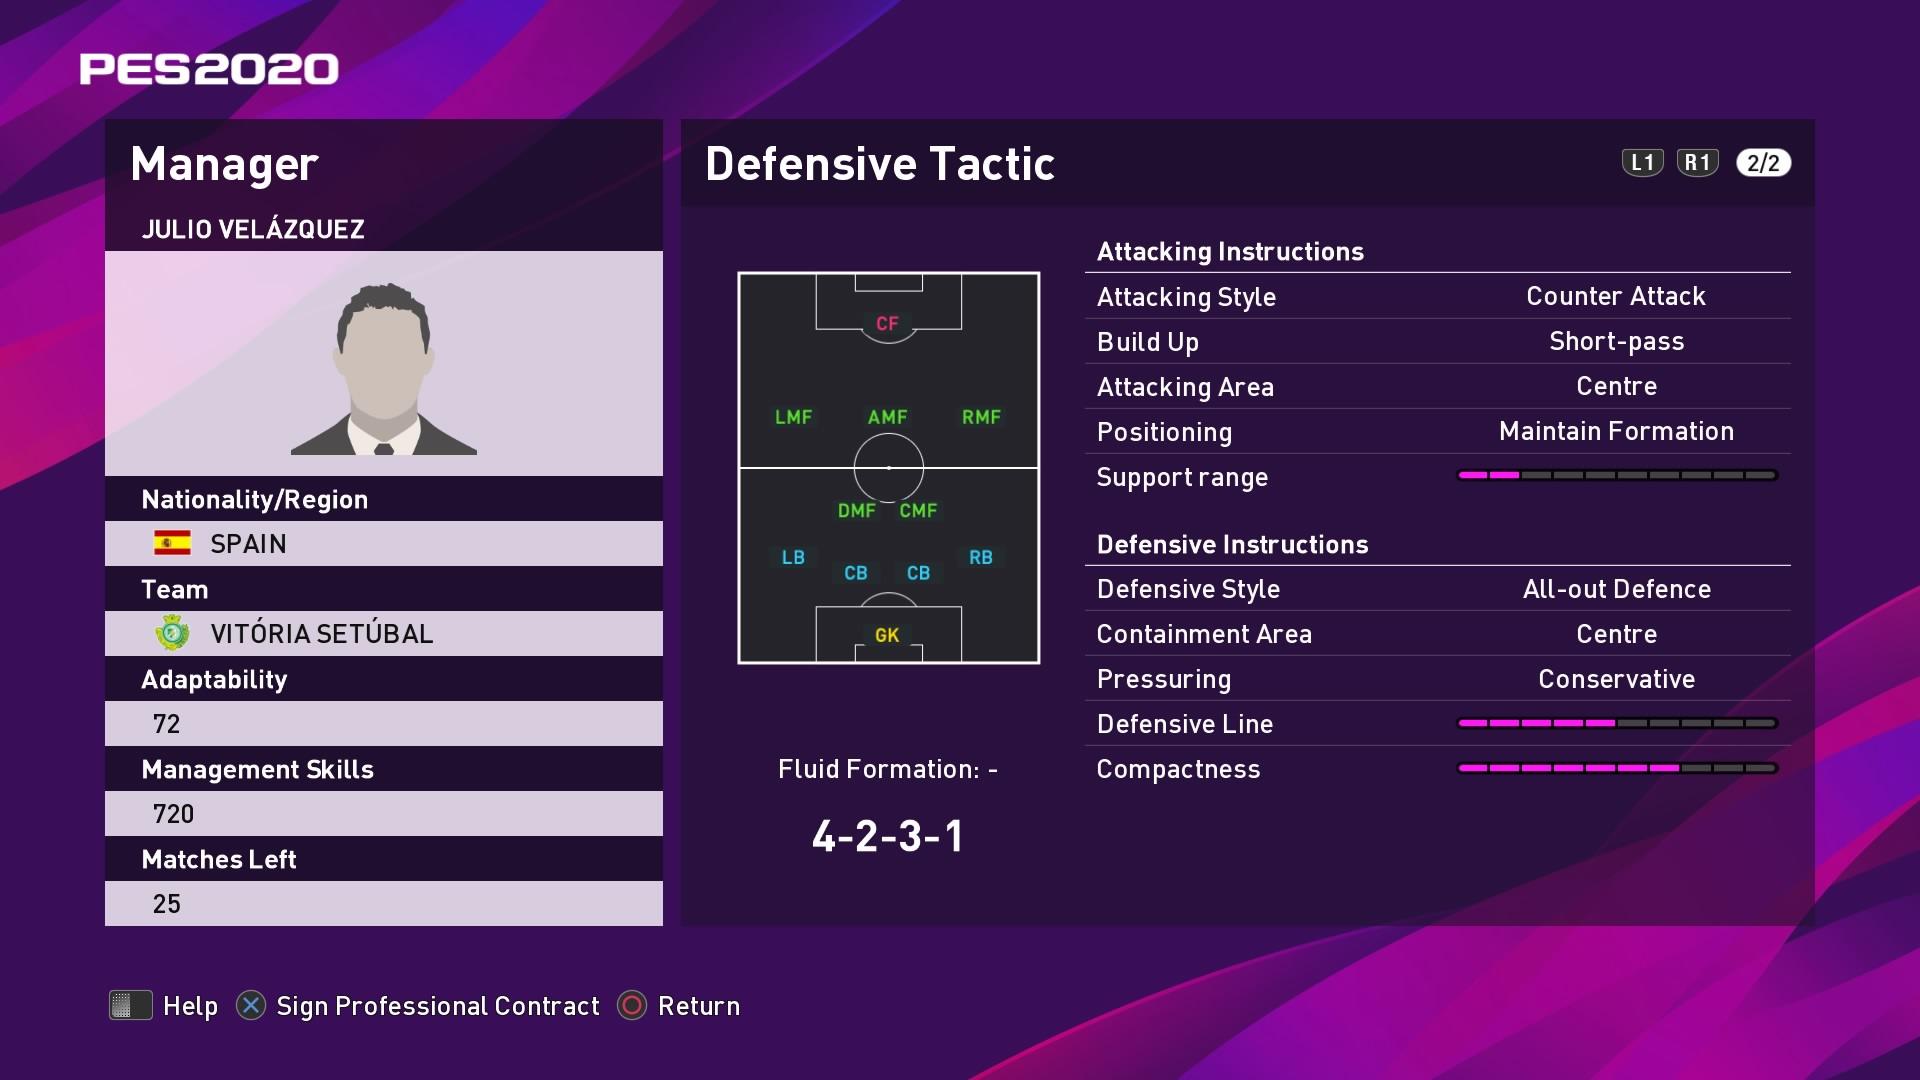 Julio Velázquez Defensive Tactic in PES 2020 myClub